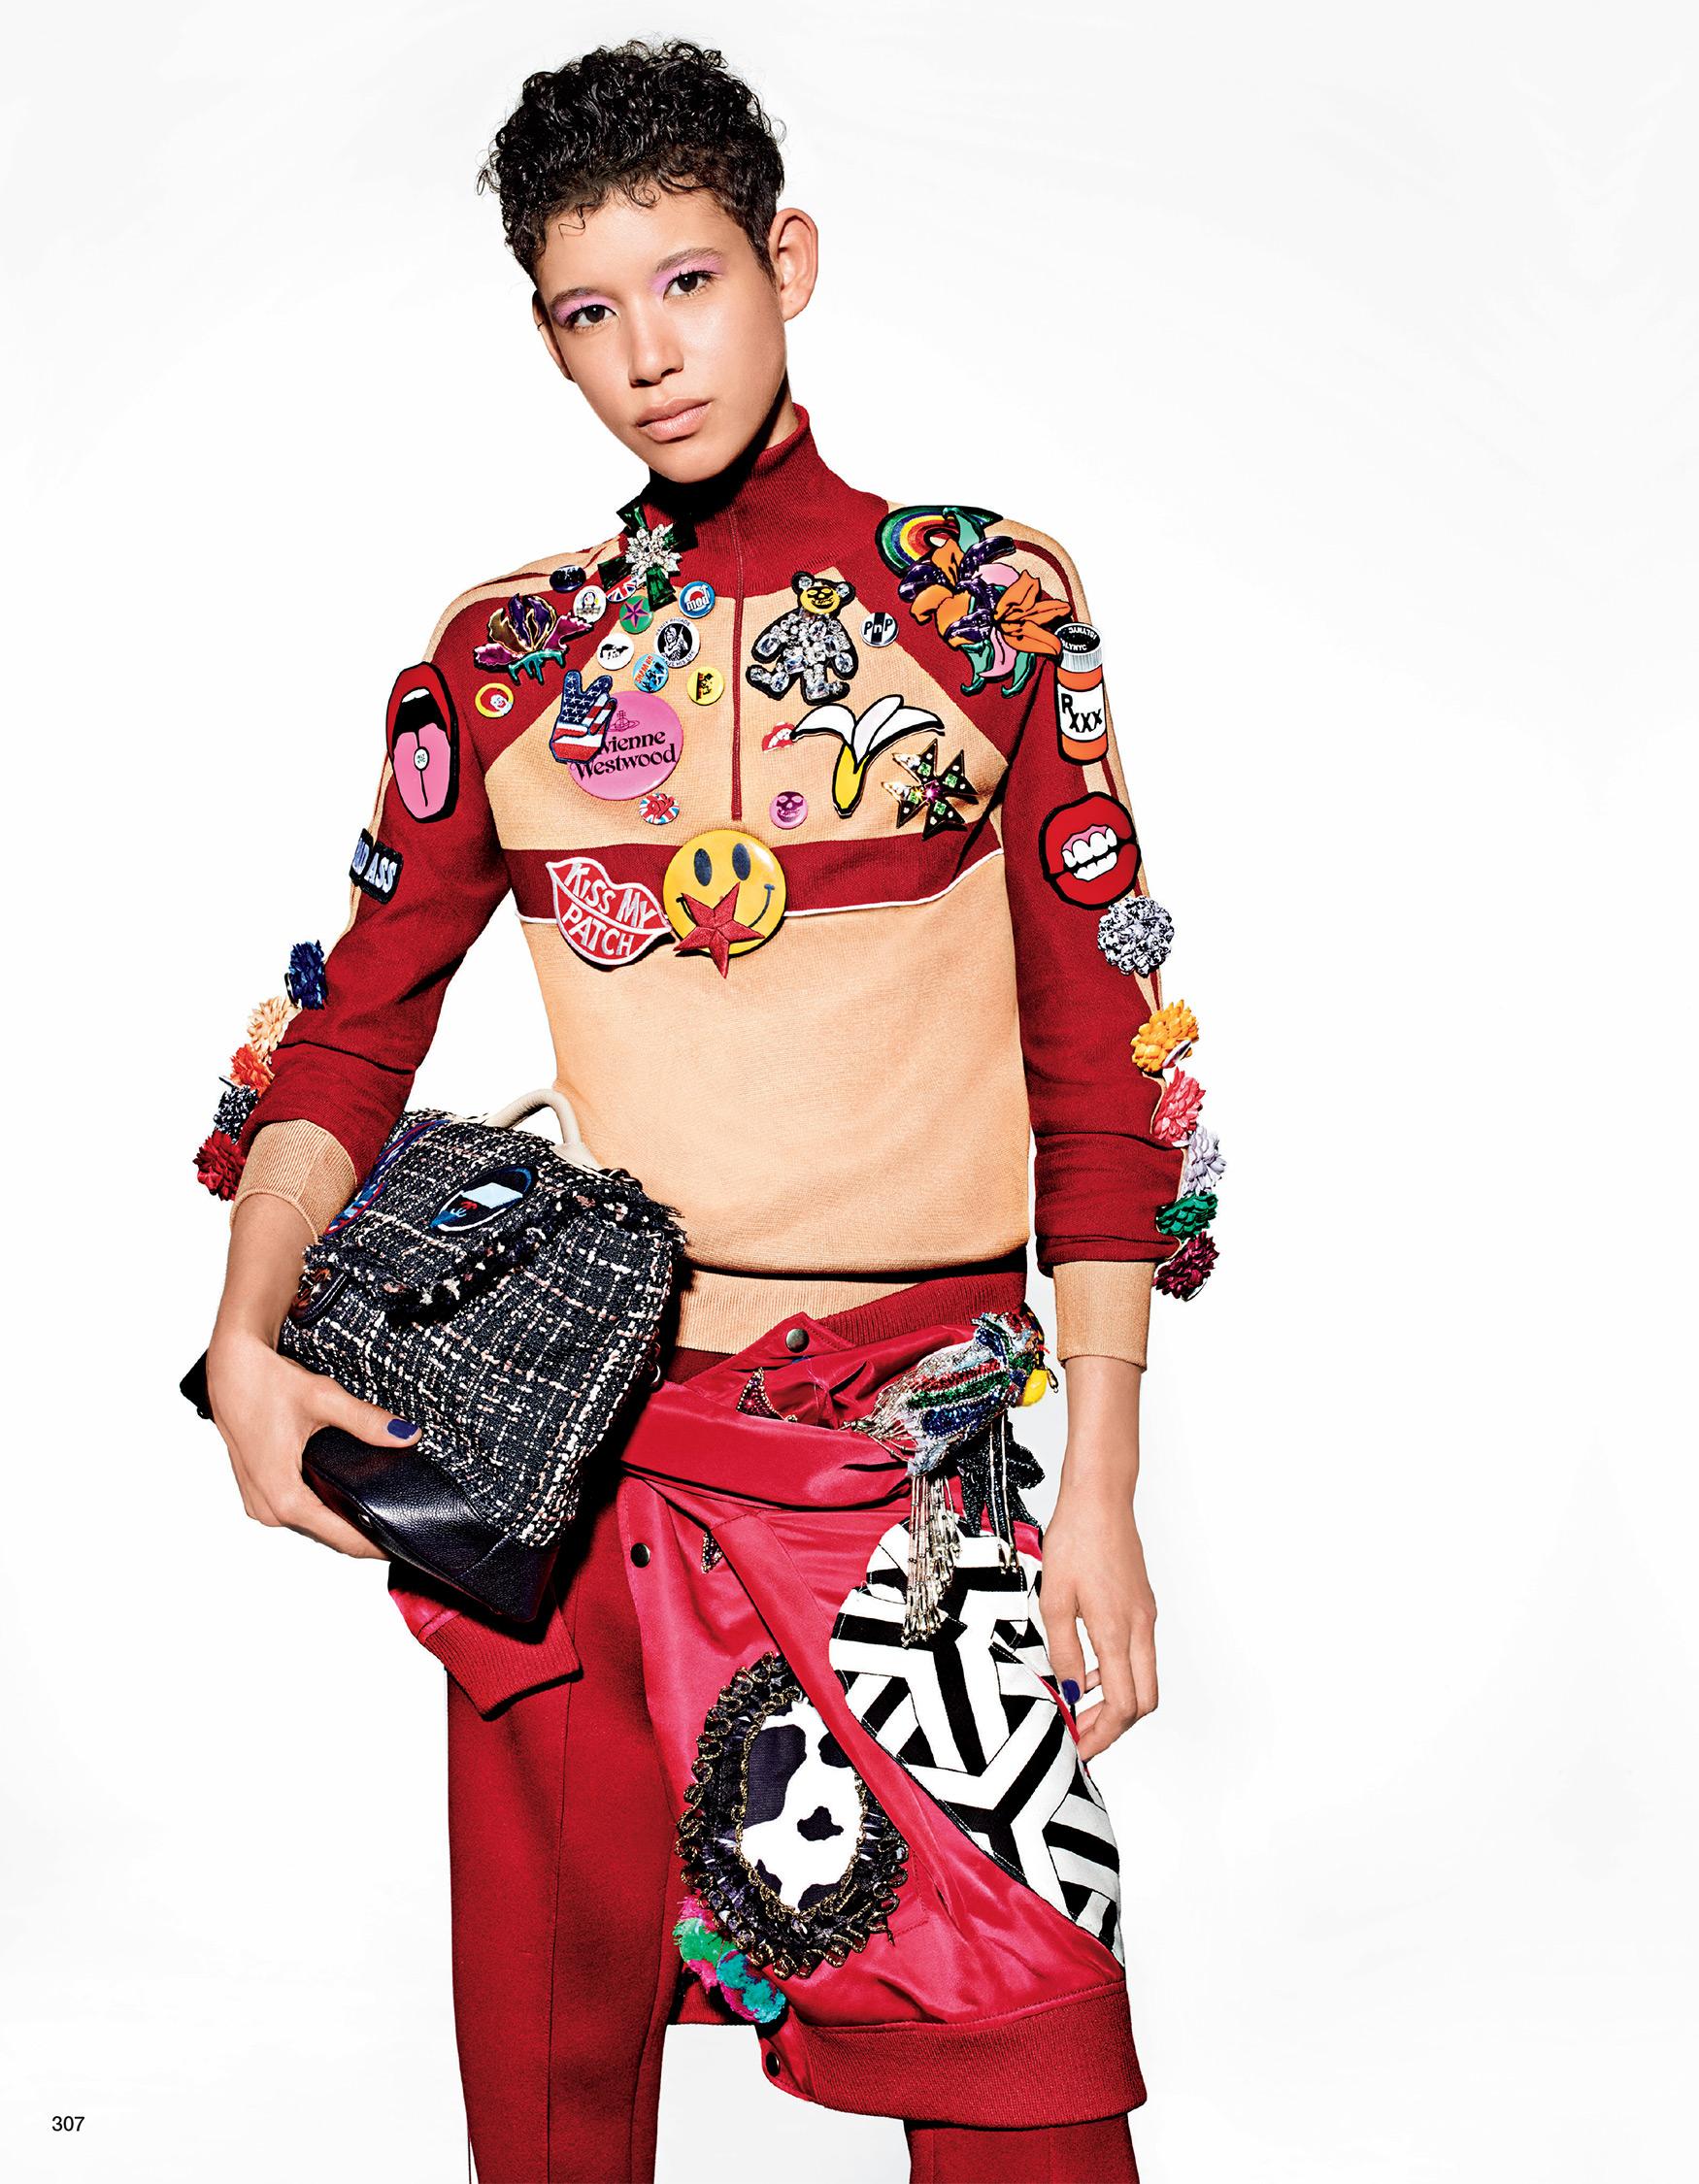 Giovanna-Battaglia-Vogue-Japan-The-Geek-Girls-Society-Richard-Brubridge-1.jpg